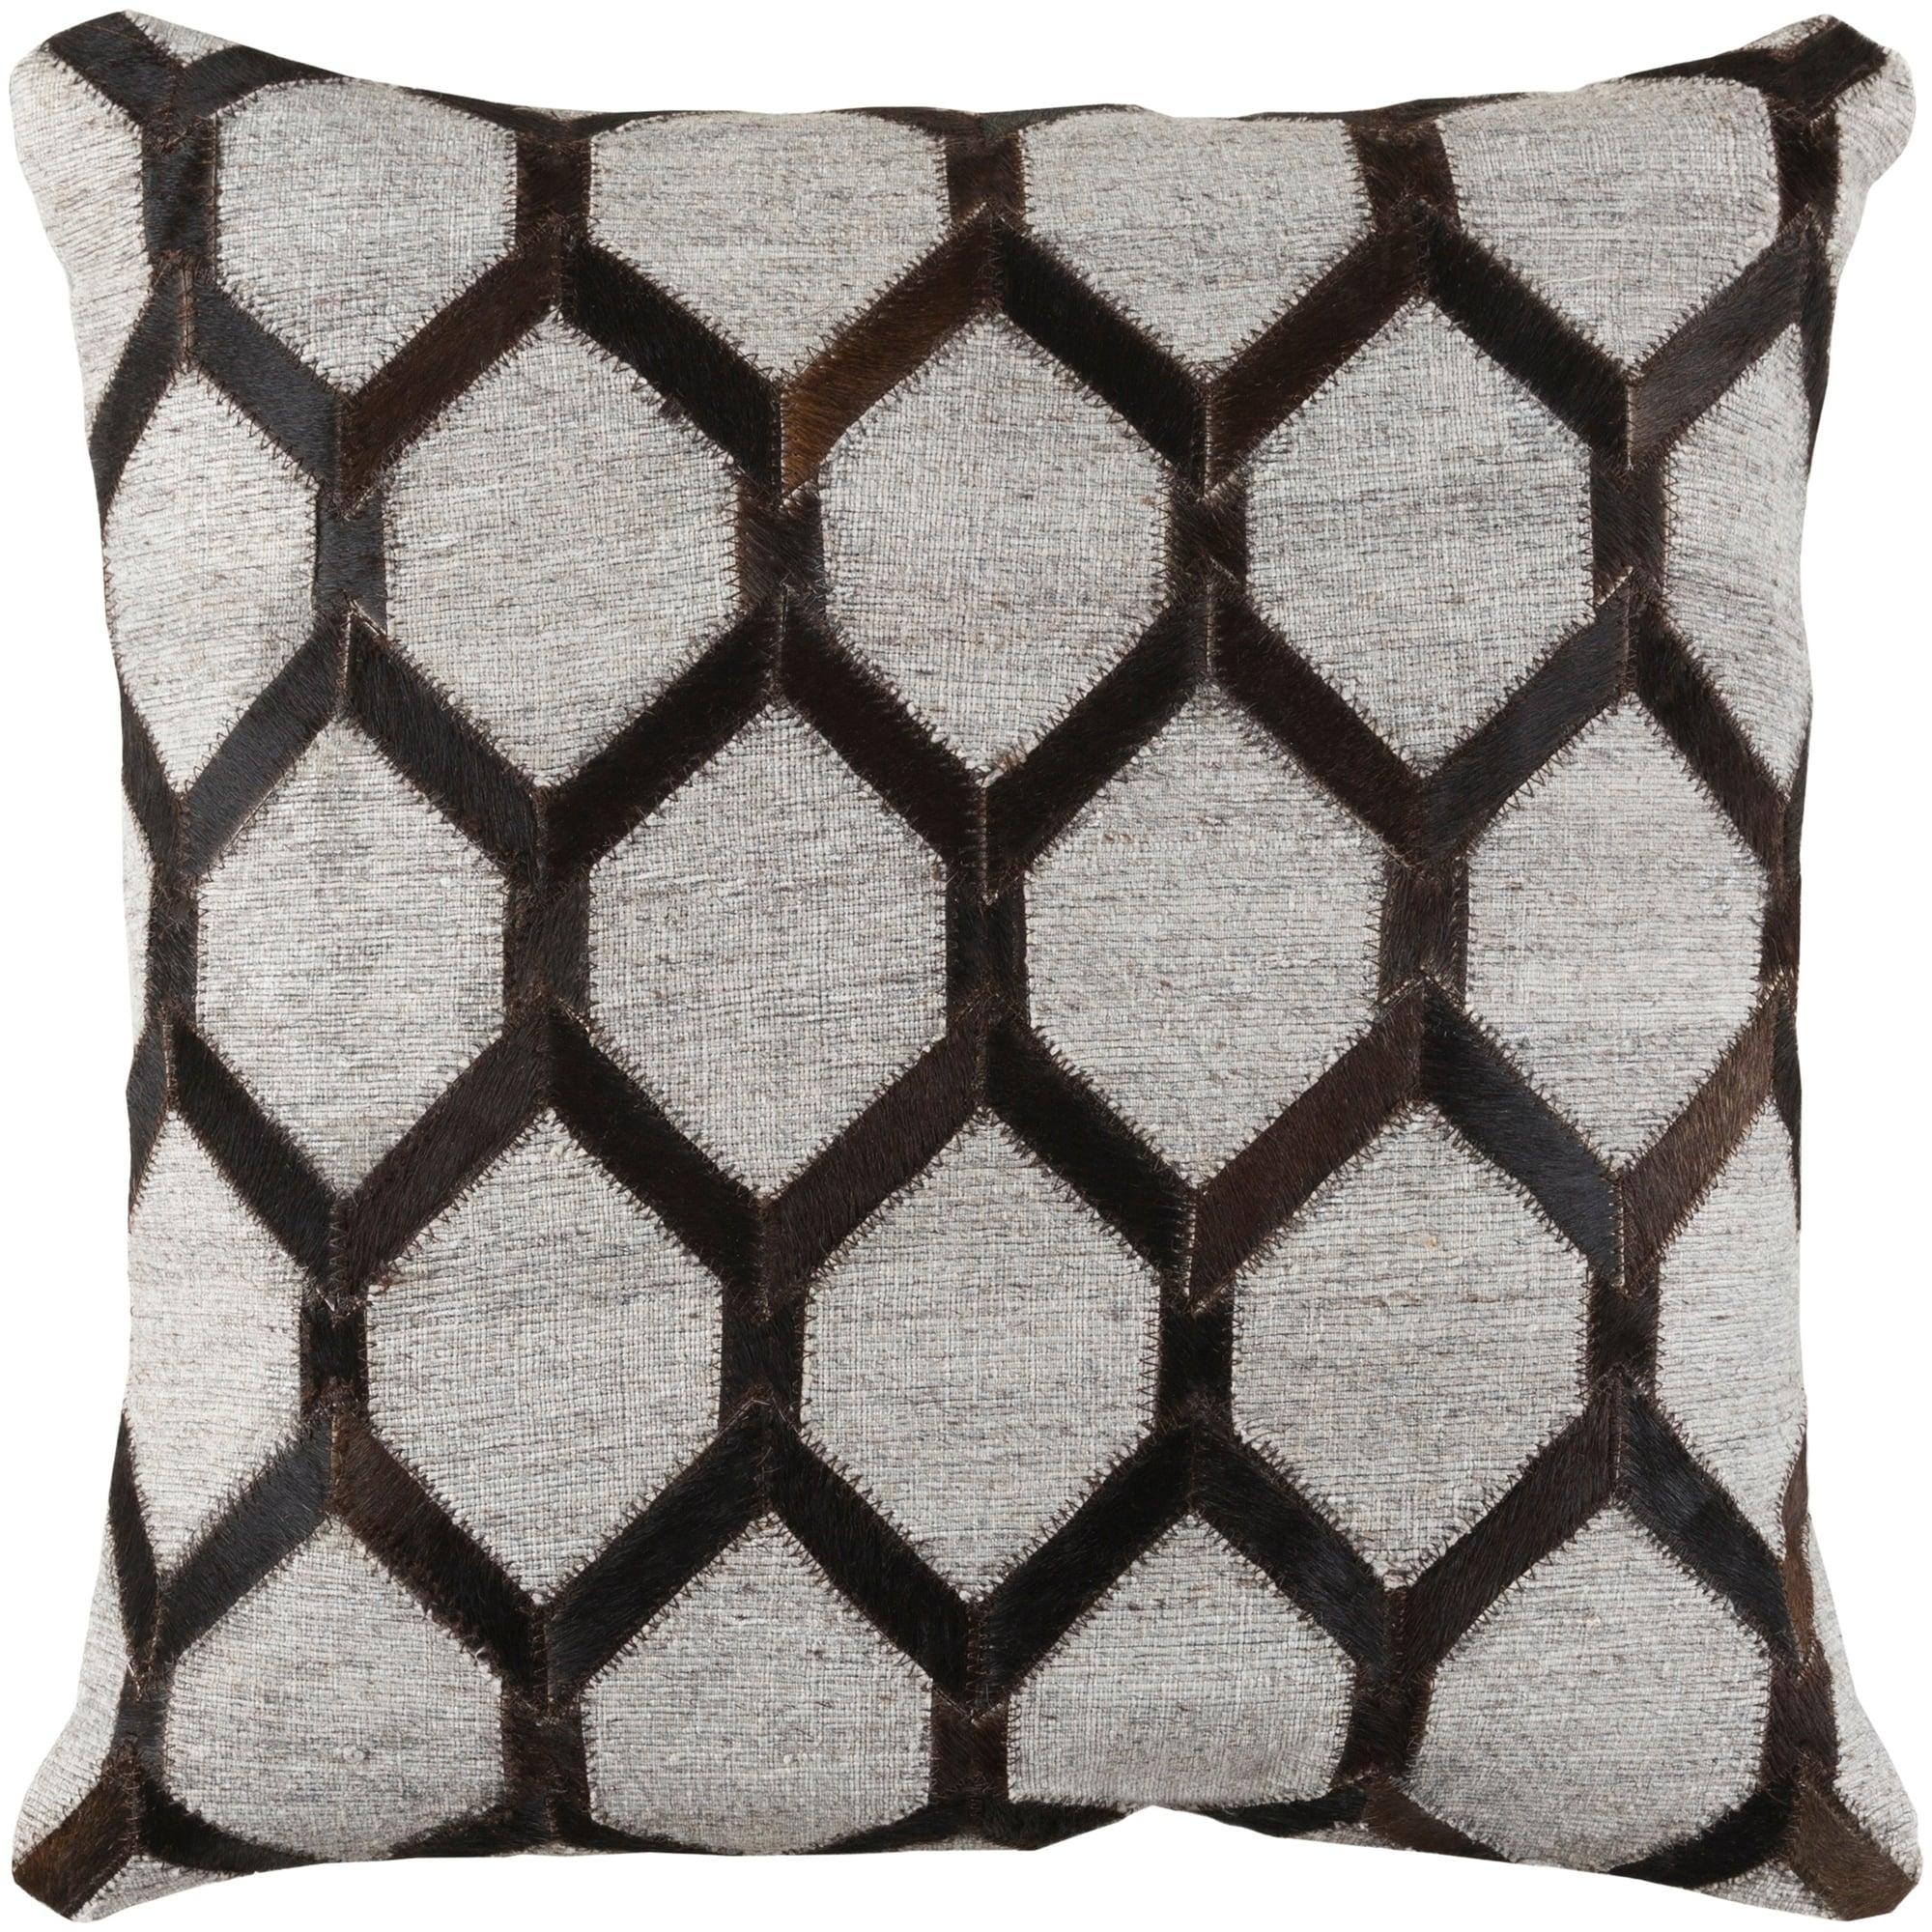 Decorative Schroeder Dark Brown 20 Inch Throw Pillow Cover Overstock 23143380